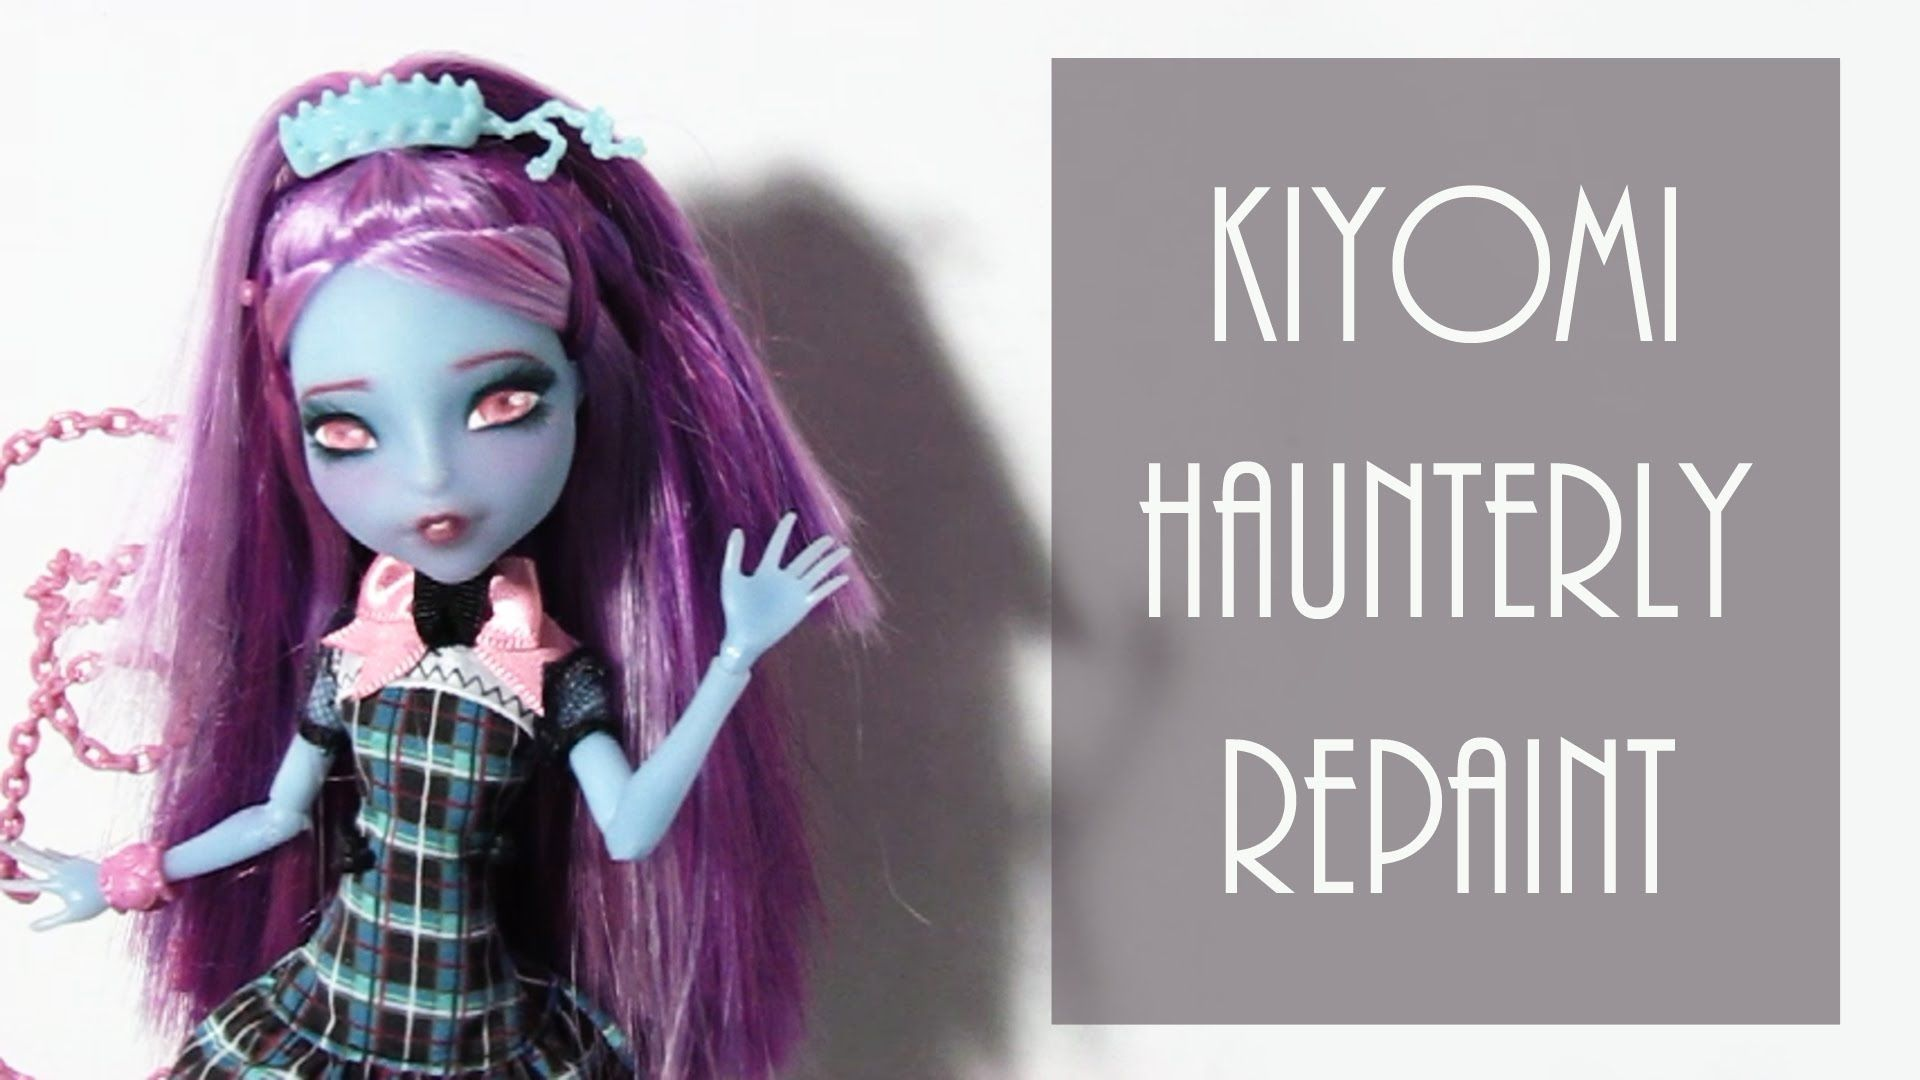 Kiyomi Haunterly Repaint Youtube Chalk Pastels Acetone